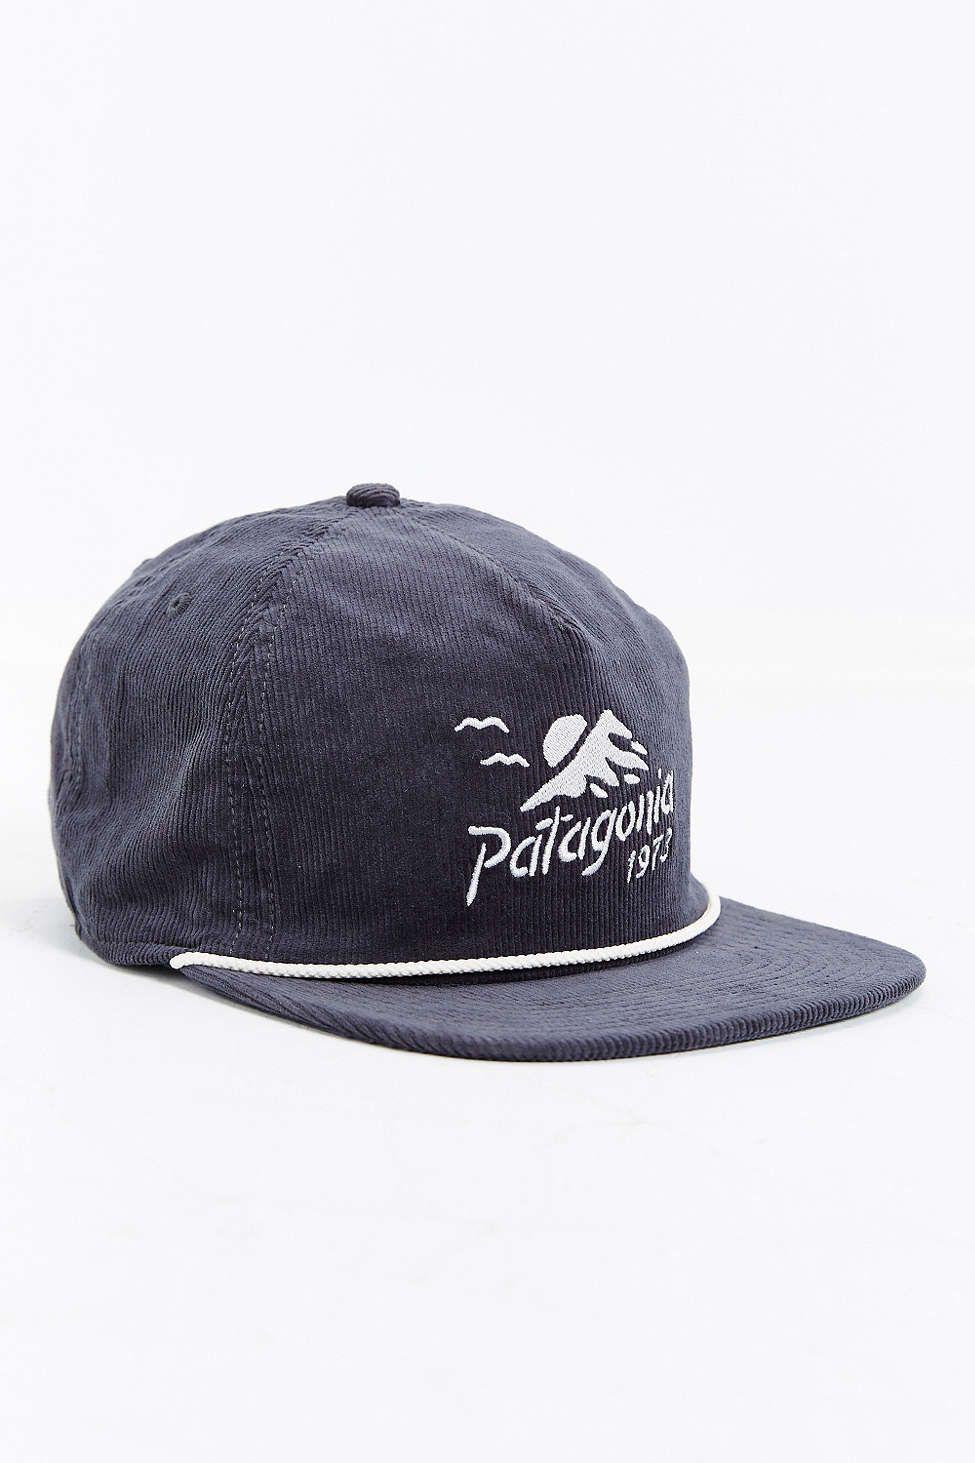 5710c068b8b I WANT I WANT I WANT       Patagonia Coastal Range Corduroy Hat